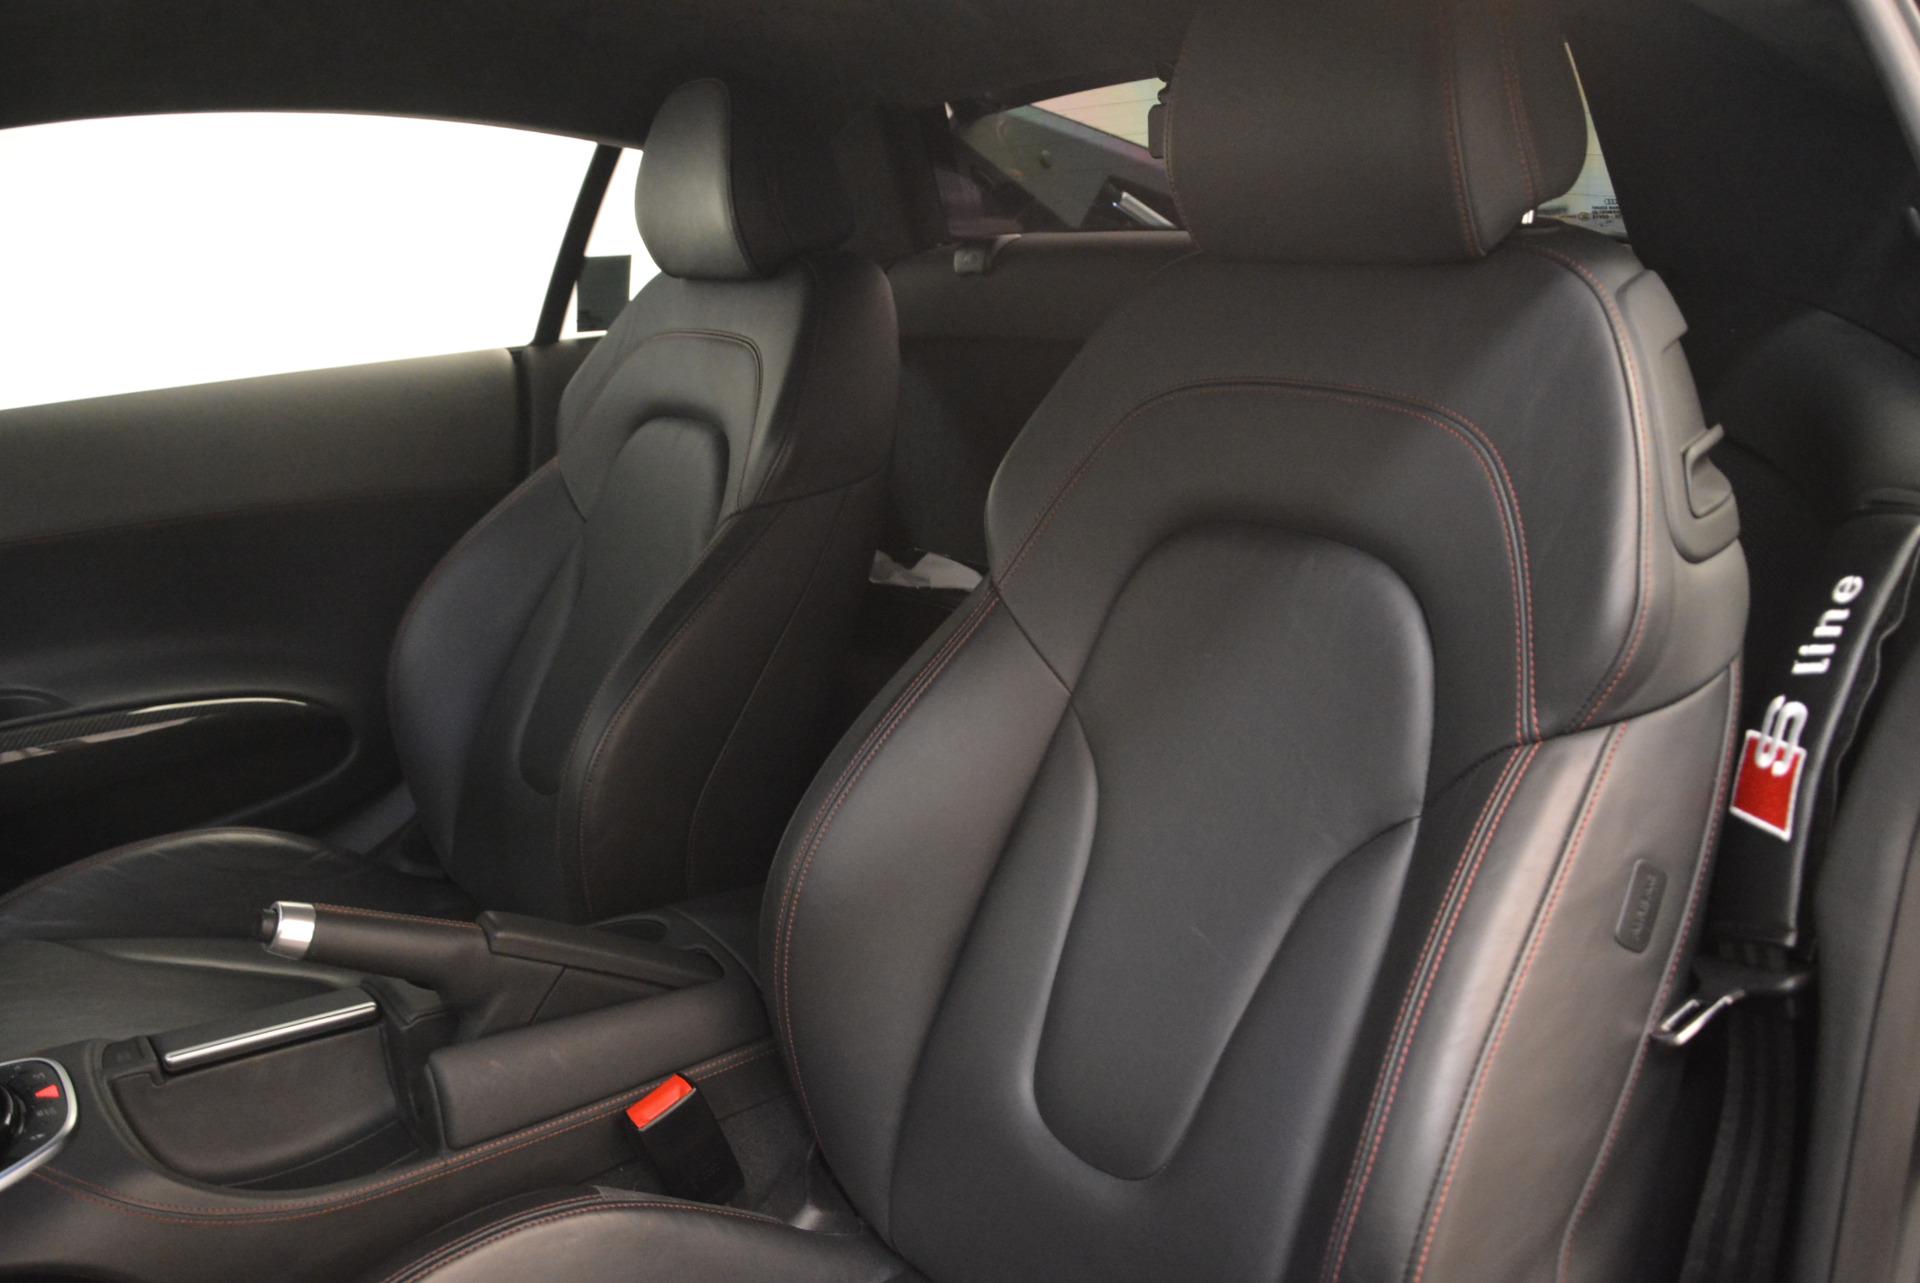 Used 2014 Audi R8 5.2 quattro For Sale In Greenwich, CT 2147_p16